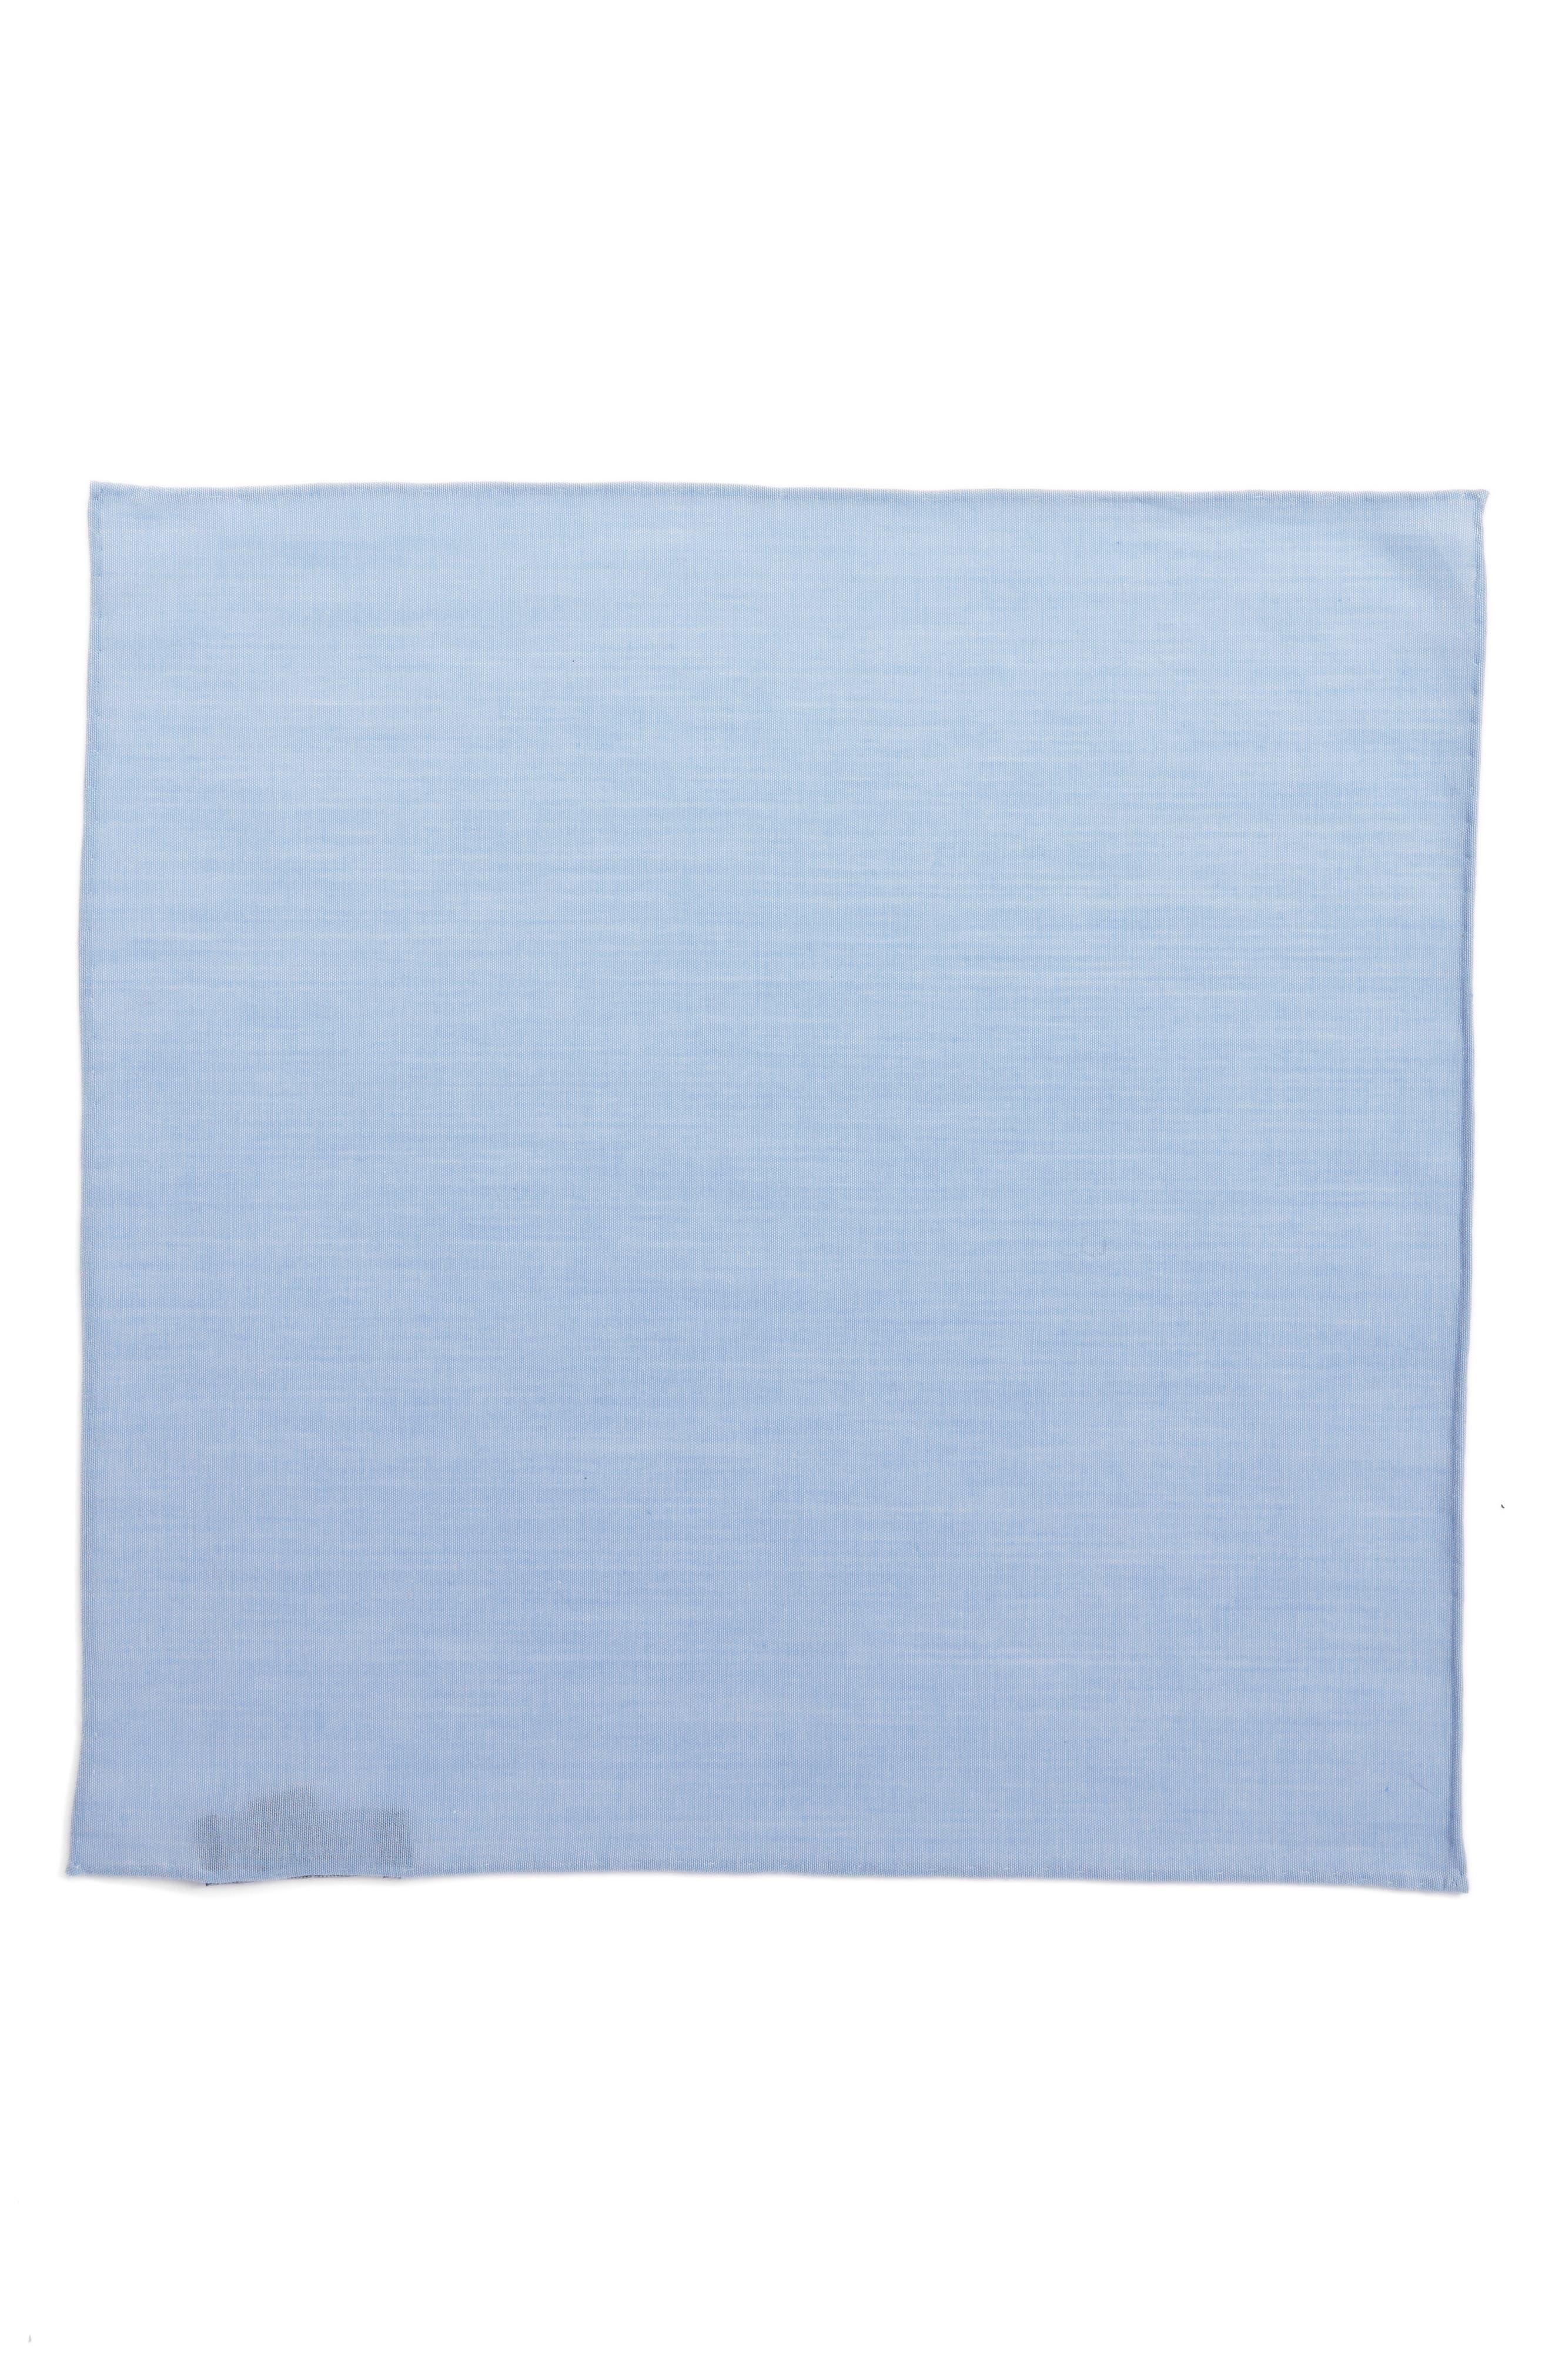 Chambray CottonPocket Square,                             Alternate thumbnail 3, color,                             455